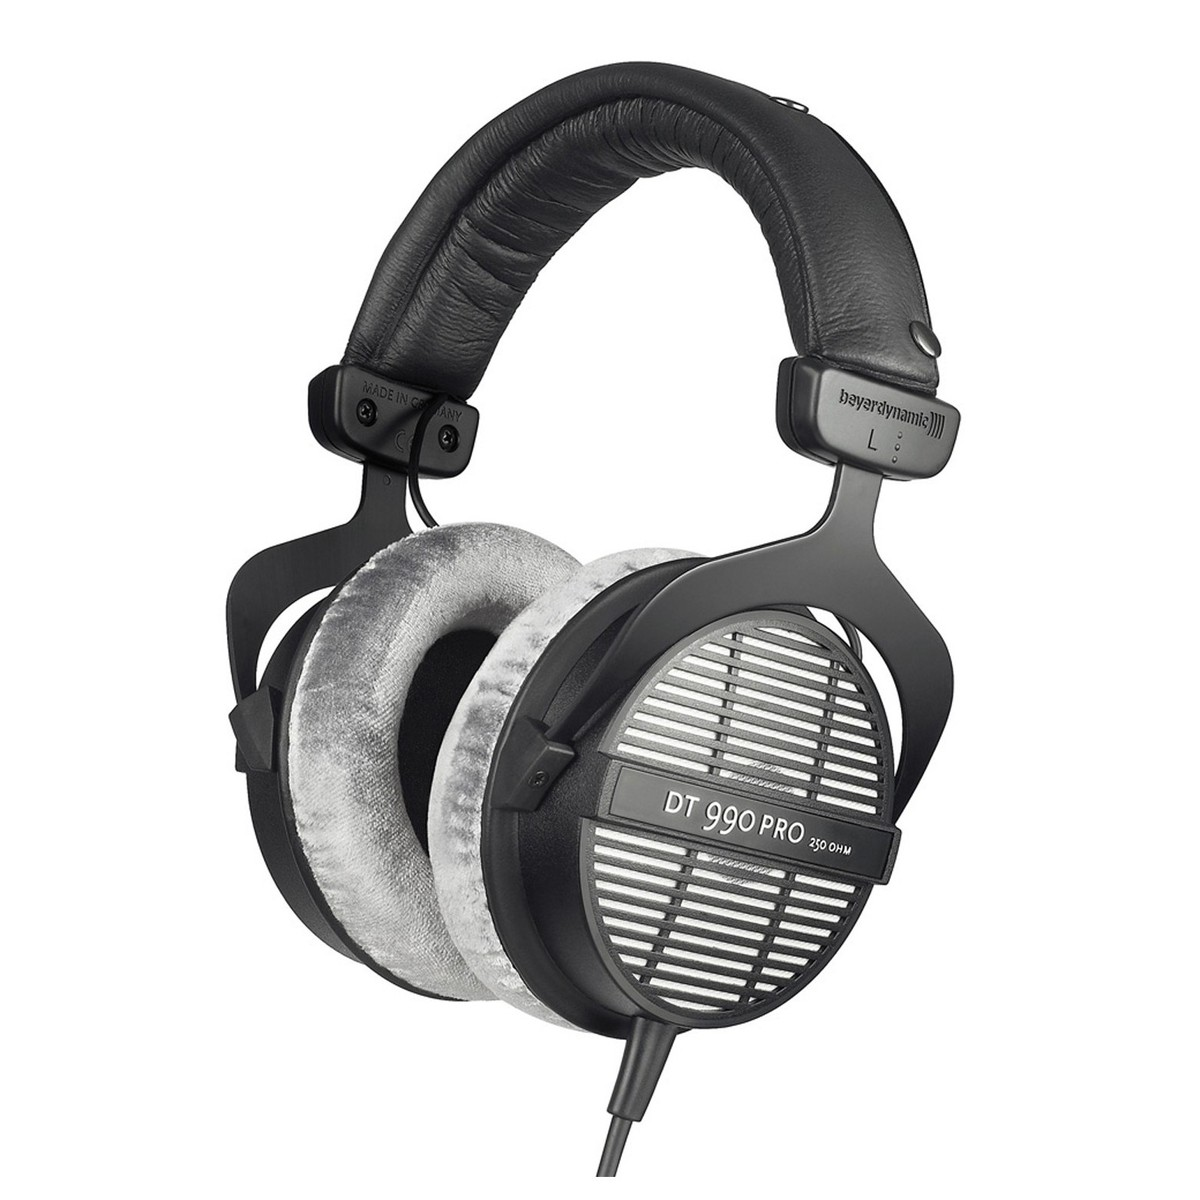 beyerdynamic dt 990 pro headphones 250 ohm at gear4music. Black Bedroom Furniture Sets. Home Design Ideas